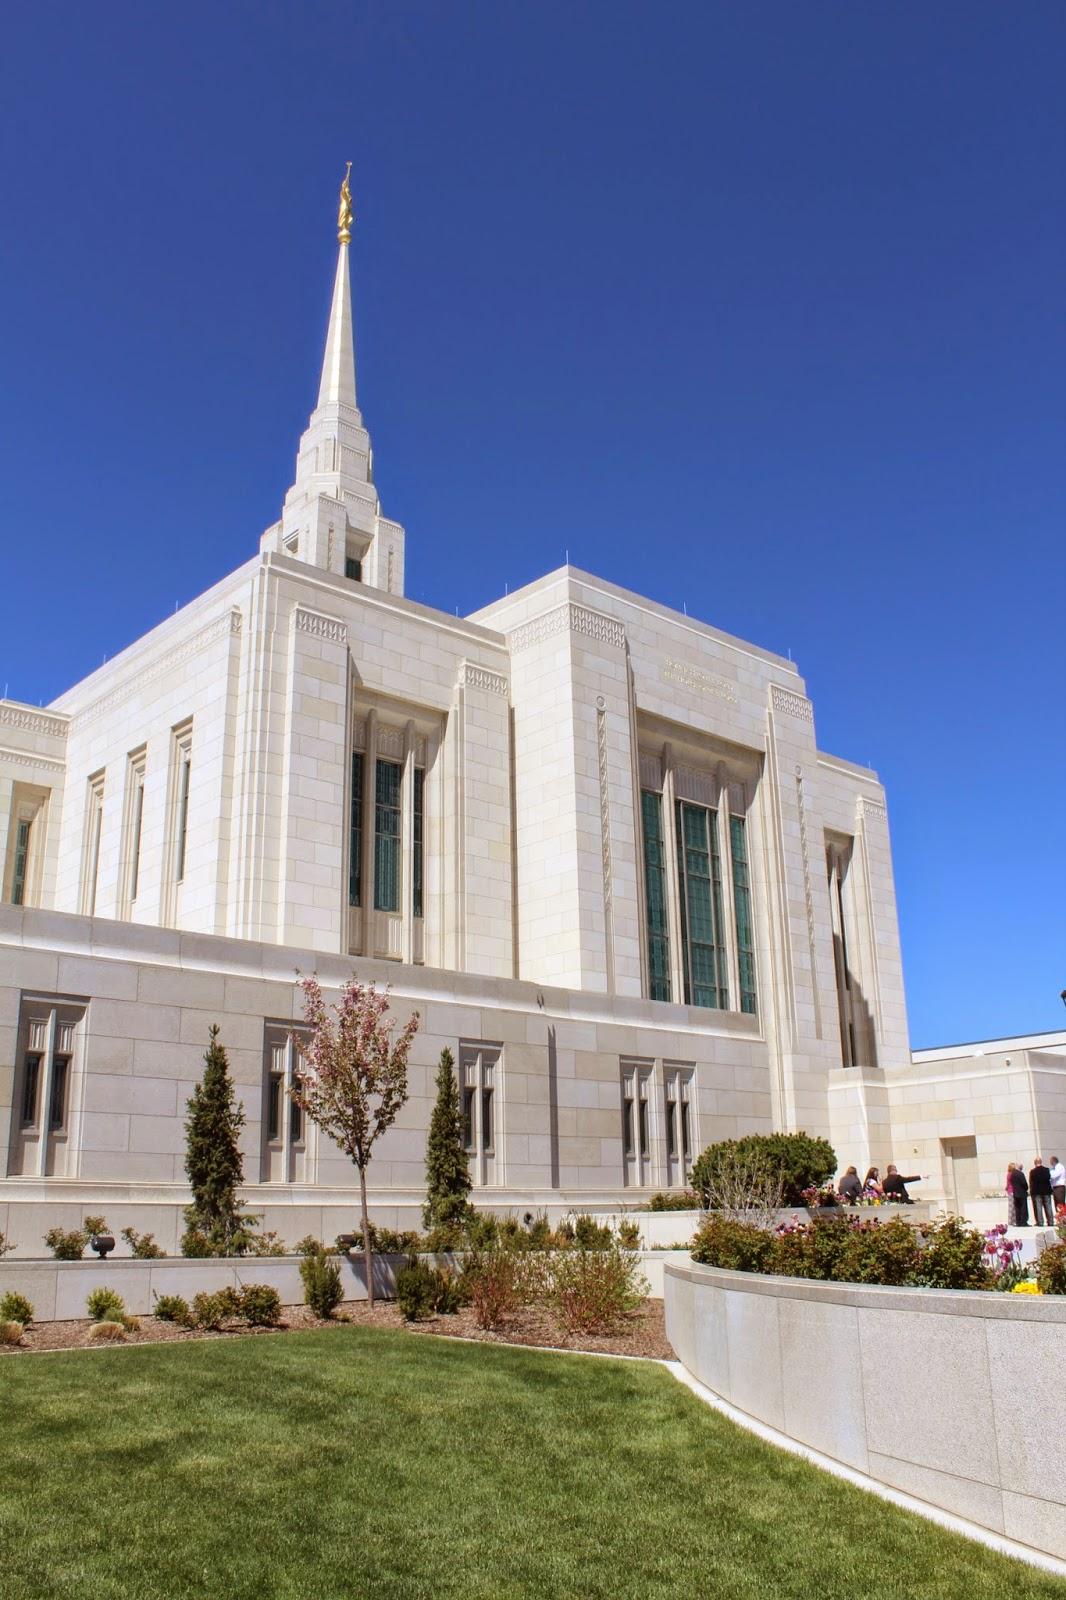 the Ogden Utah LDS temple